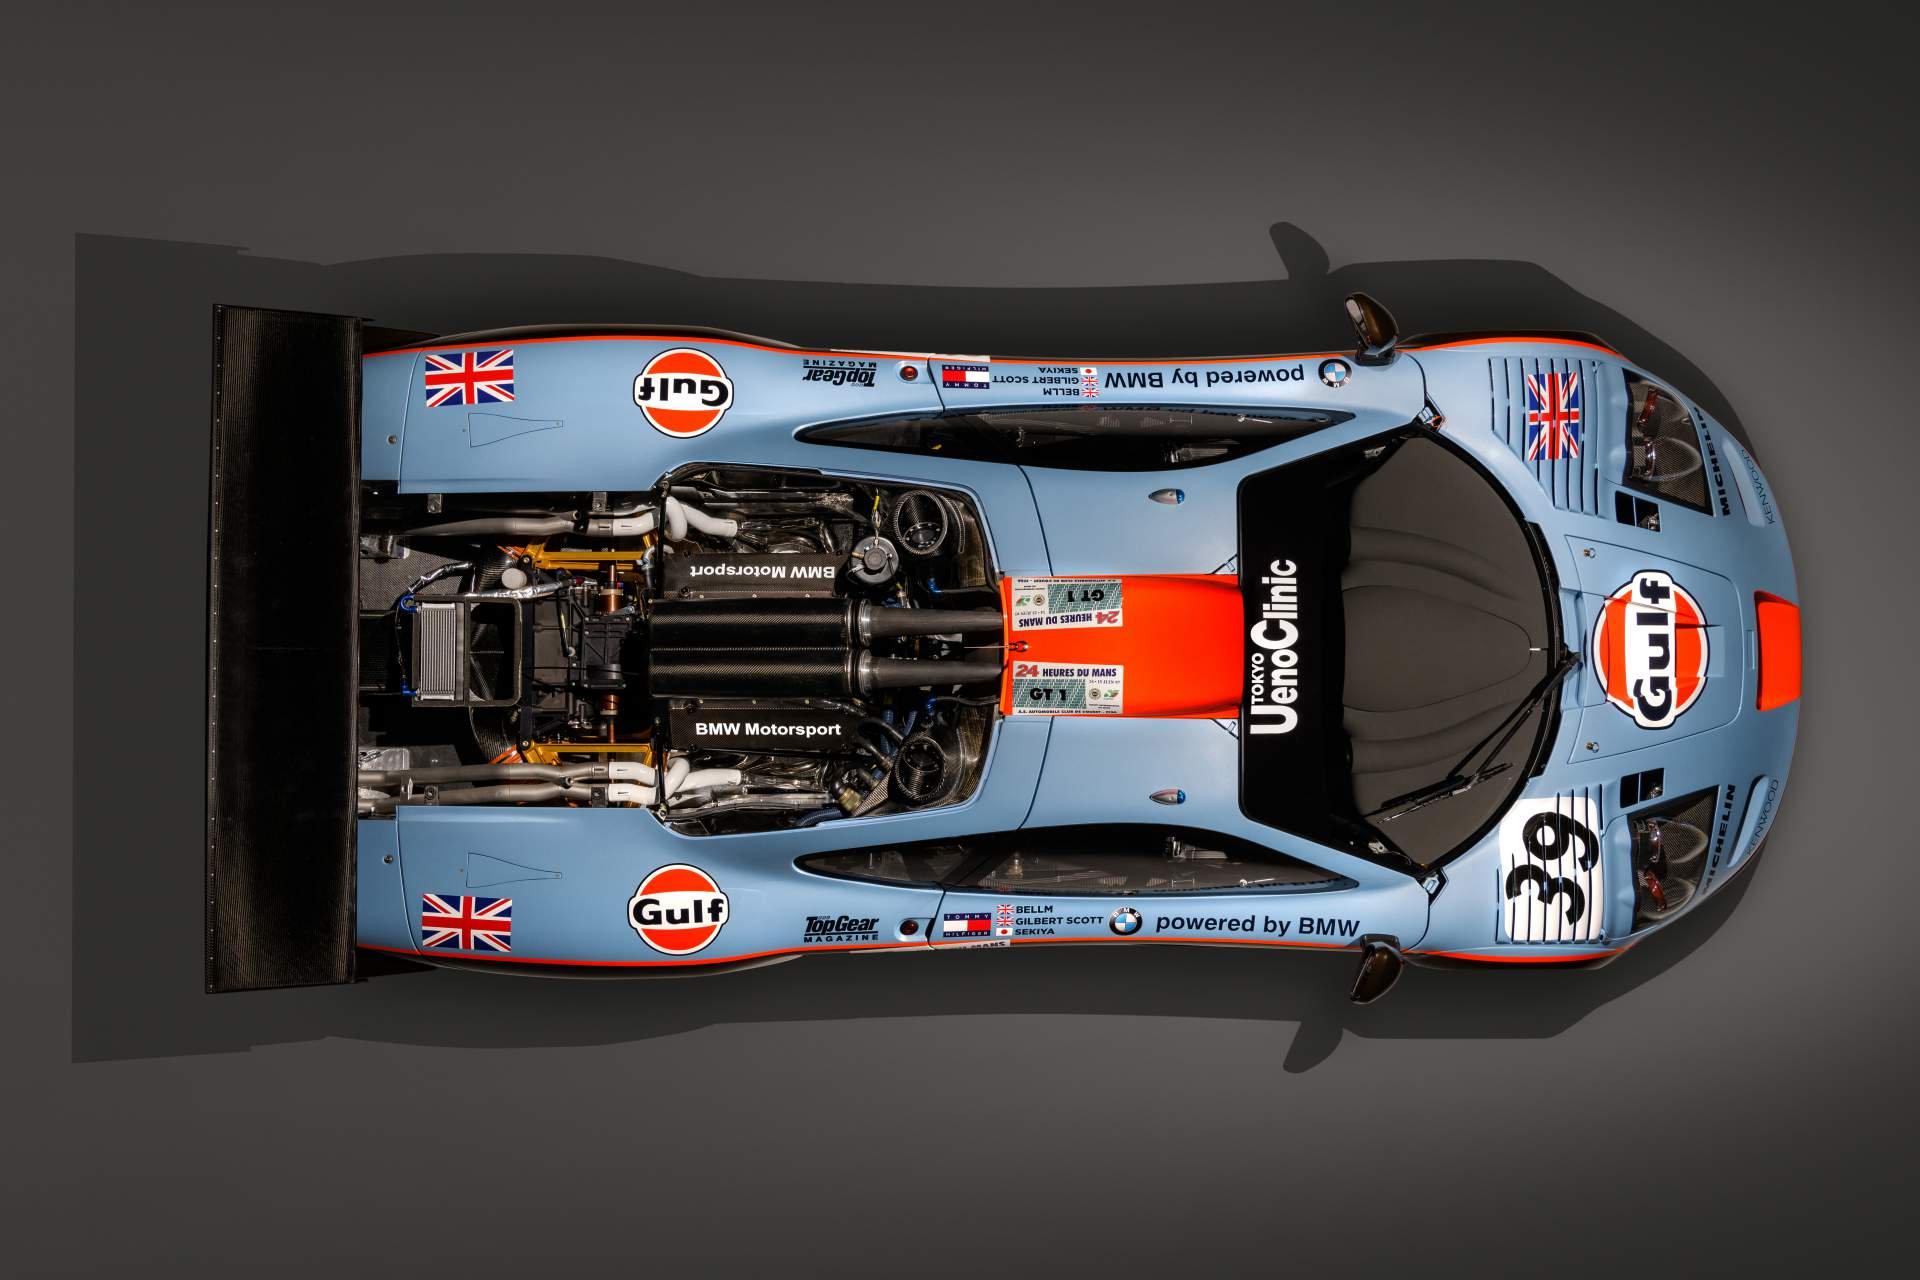 McLaren F1 GTR Longtail 25R restored by MSO (9)